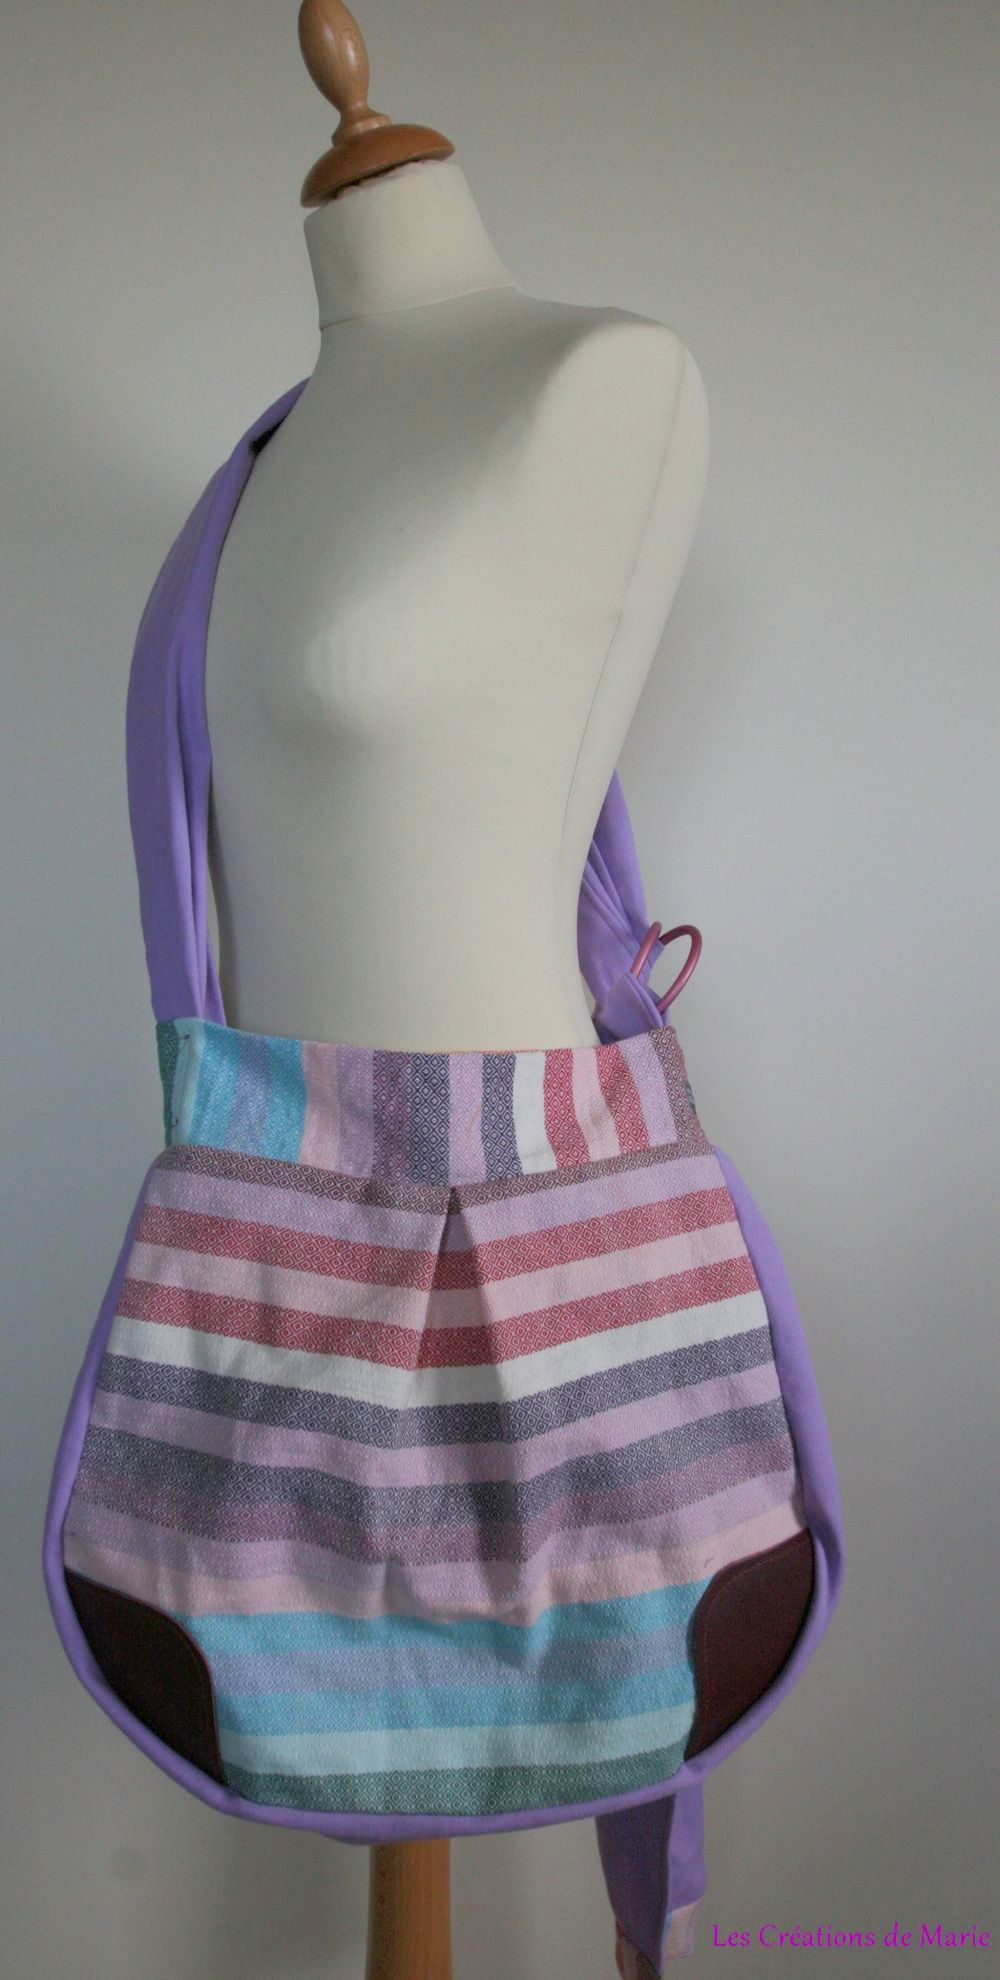 baGySling Girasol rainbow sac de portage